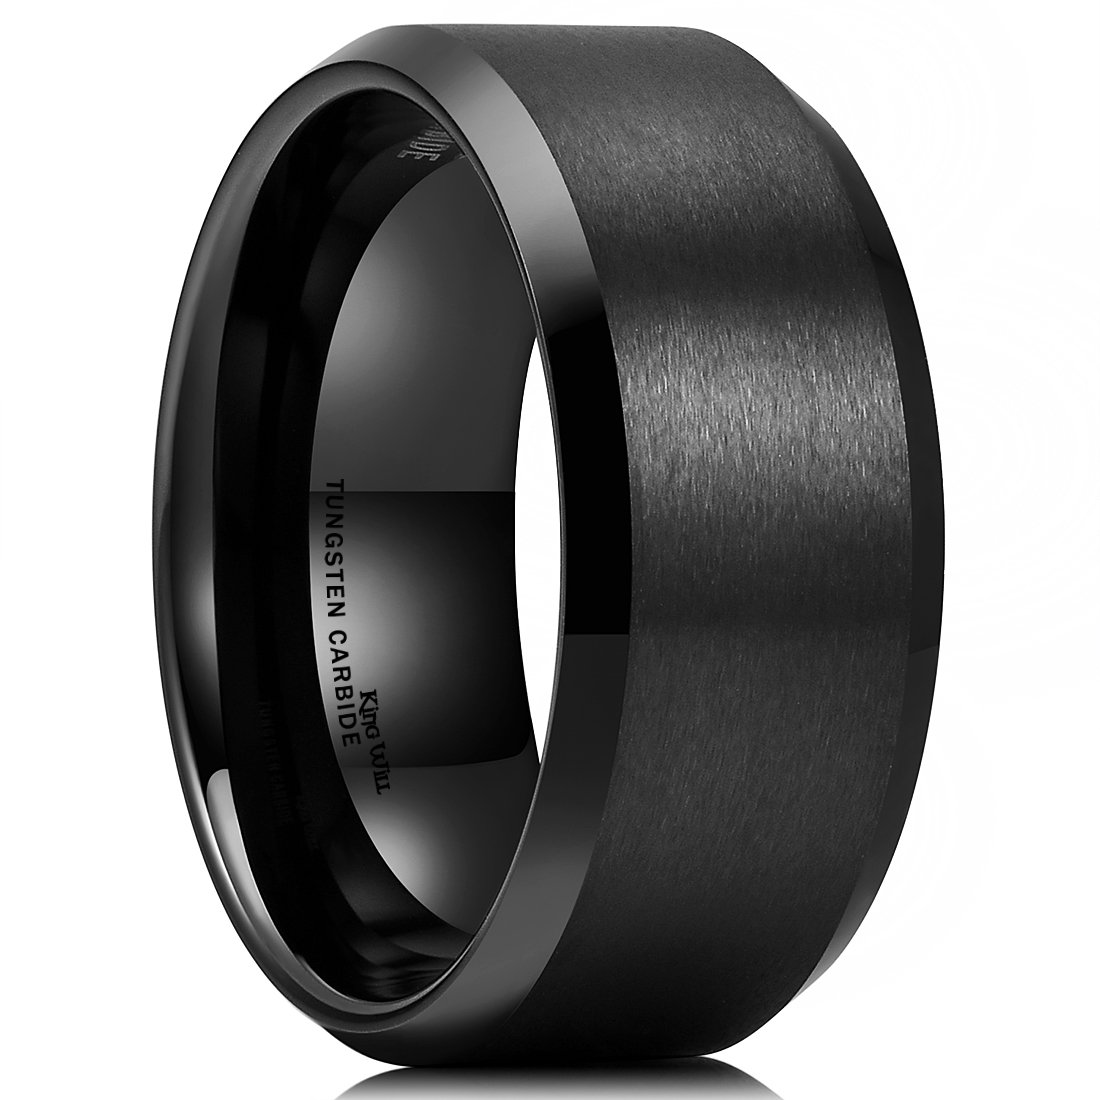 King Will Basic 6mm 7mm 8mm 9mm 10mm Men Wedding Black Tungsten Ring Matte Finish Beveled Polished Edge Comfort Fit